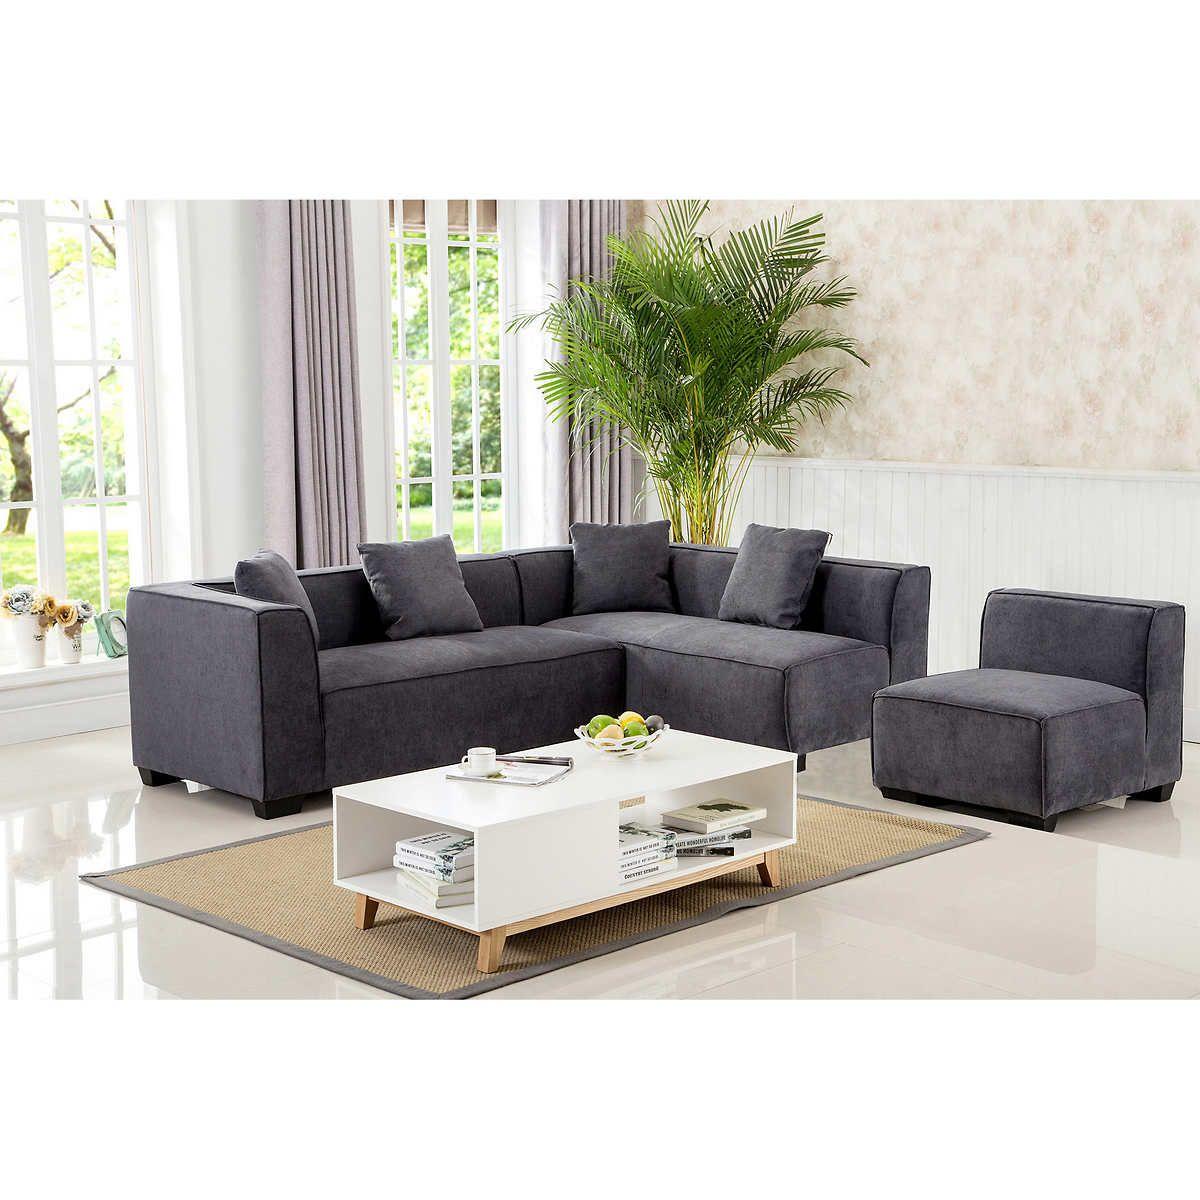 Costco Living Room Sets: Cobrizio Dark Grey Modular Sectional